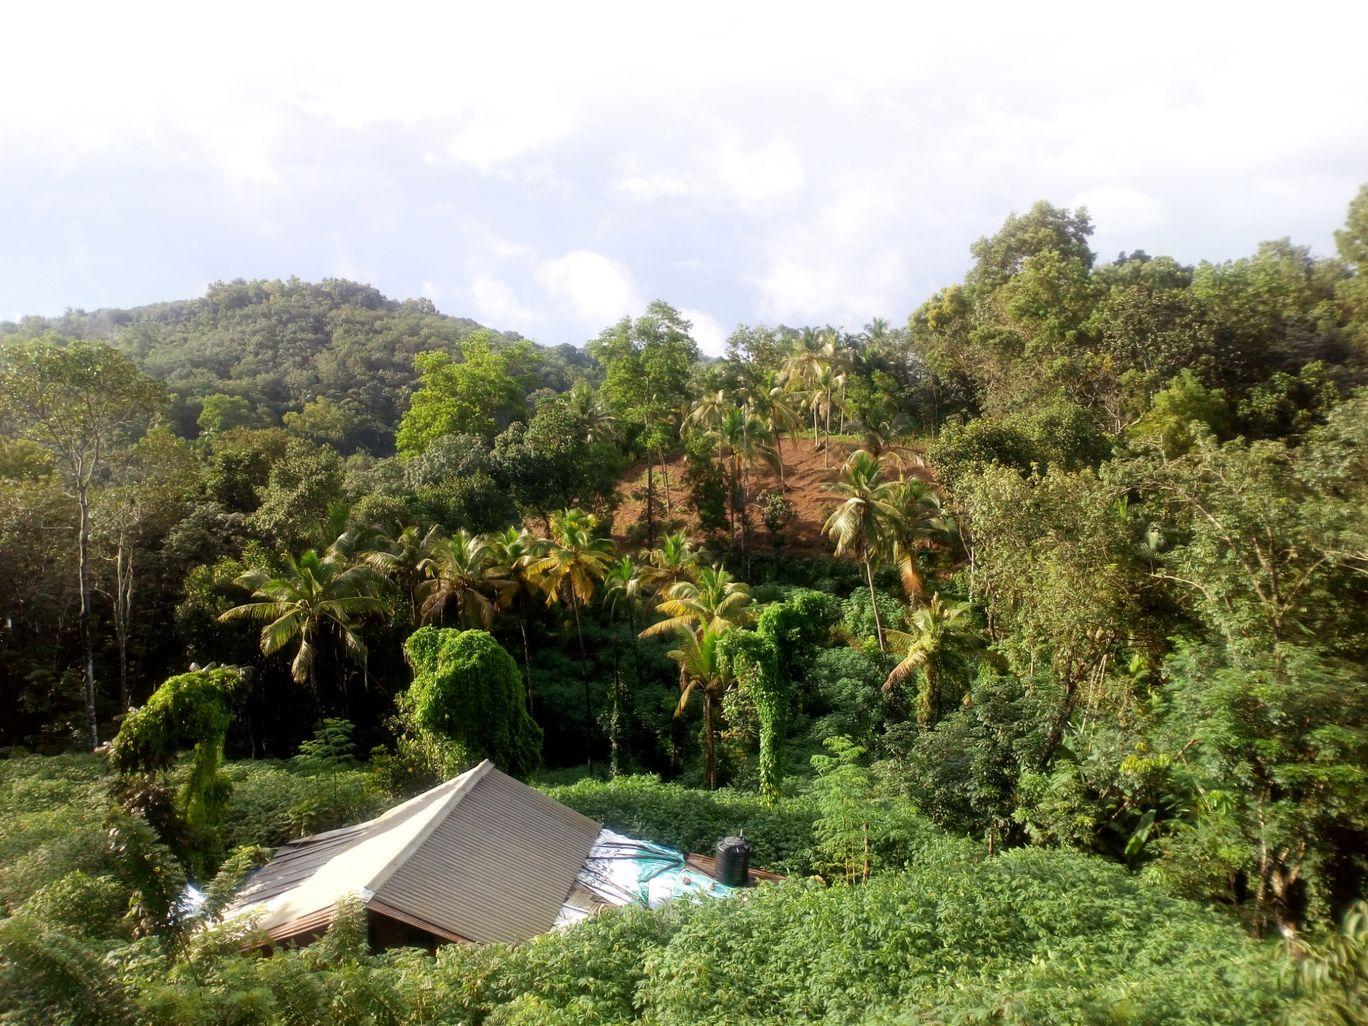 Photo of Peyad - Vellanad Rd By Ankit Paul